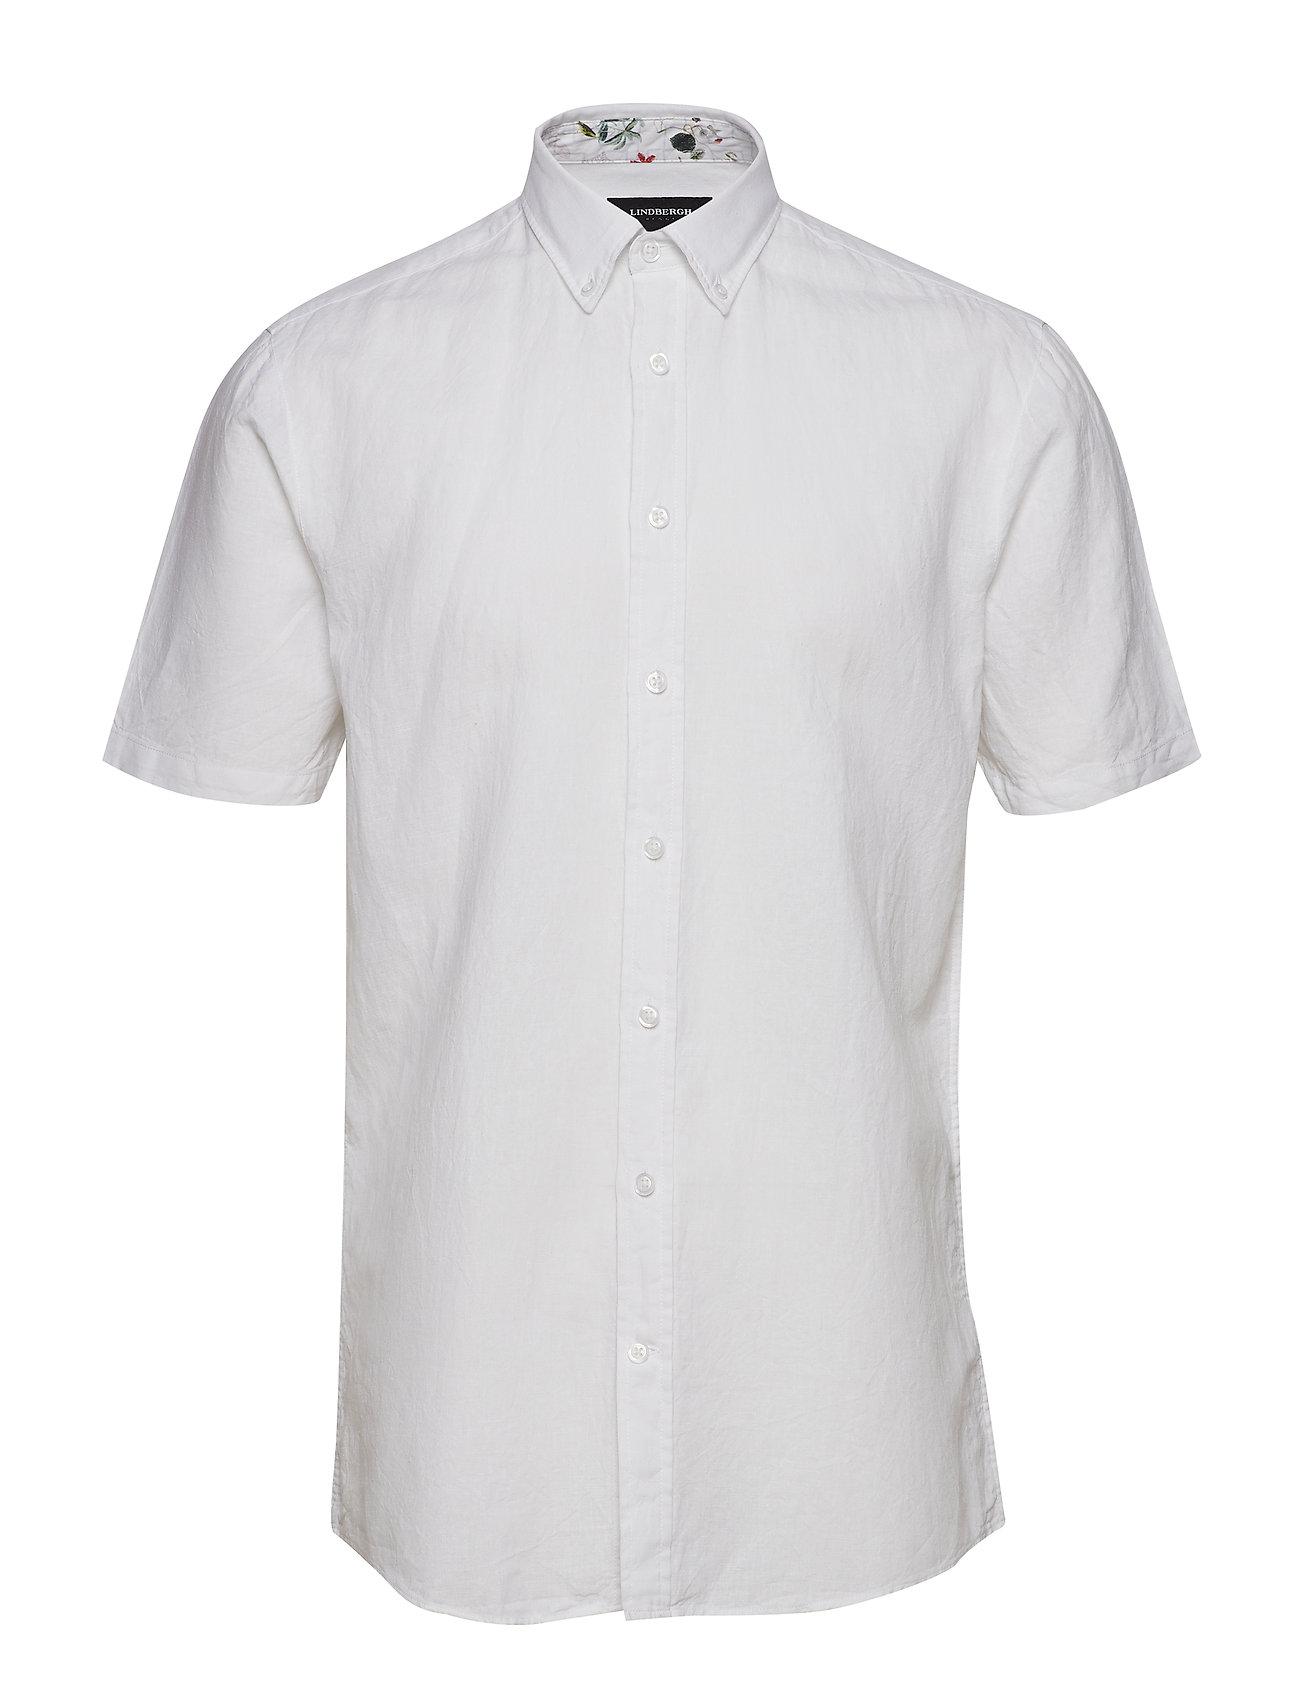 Lindbergh Solid cotton/linen shirt S/S - WHITE